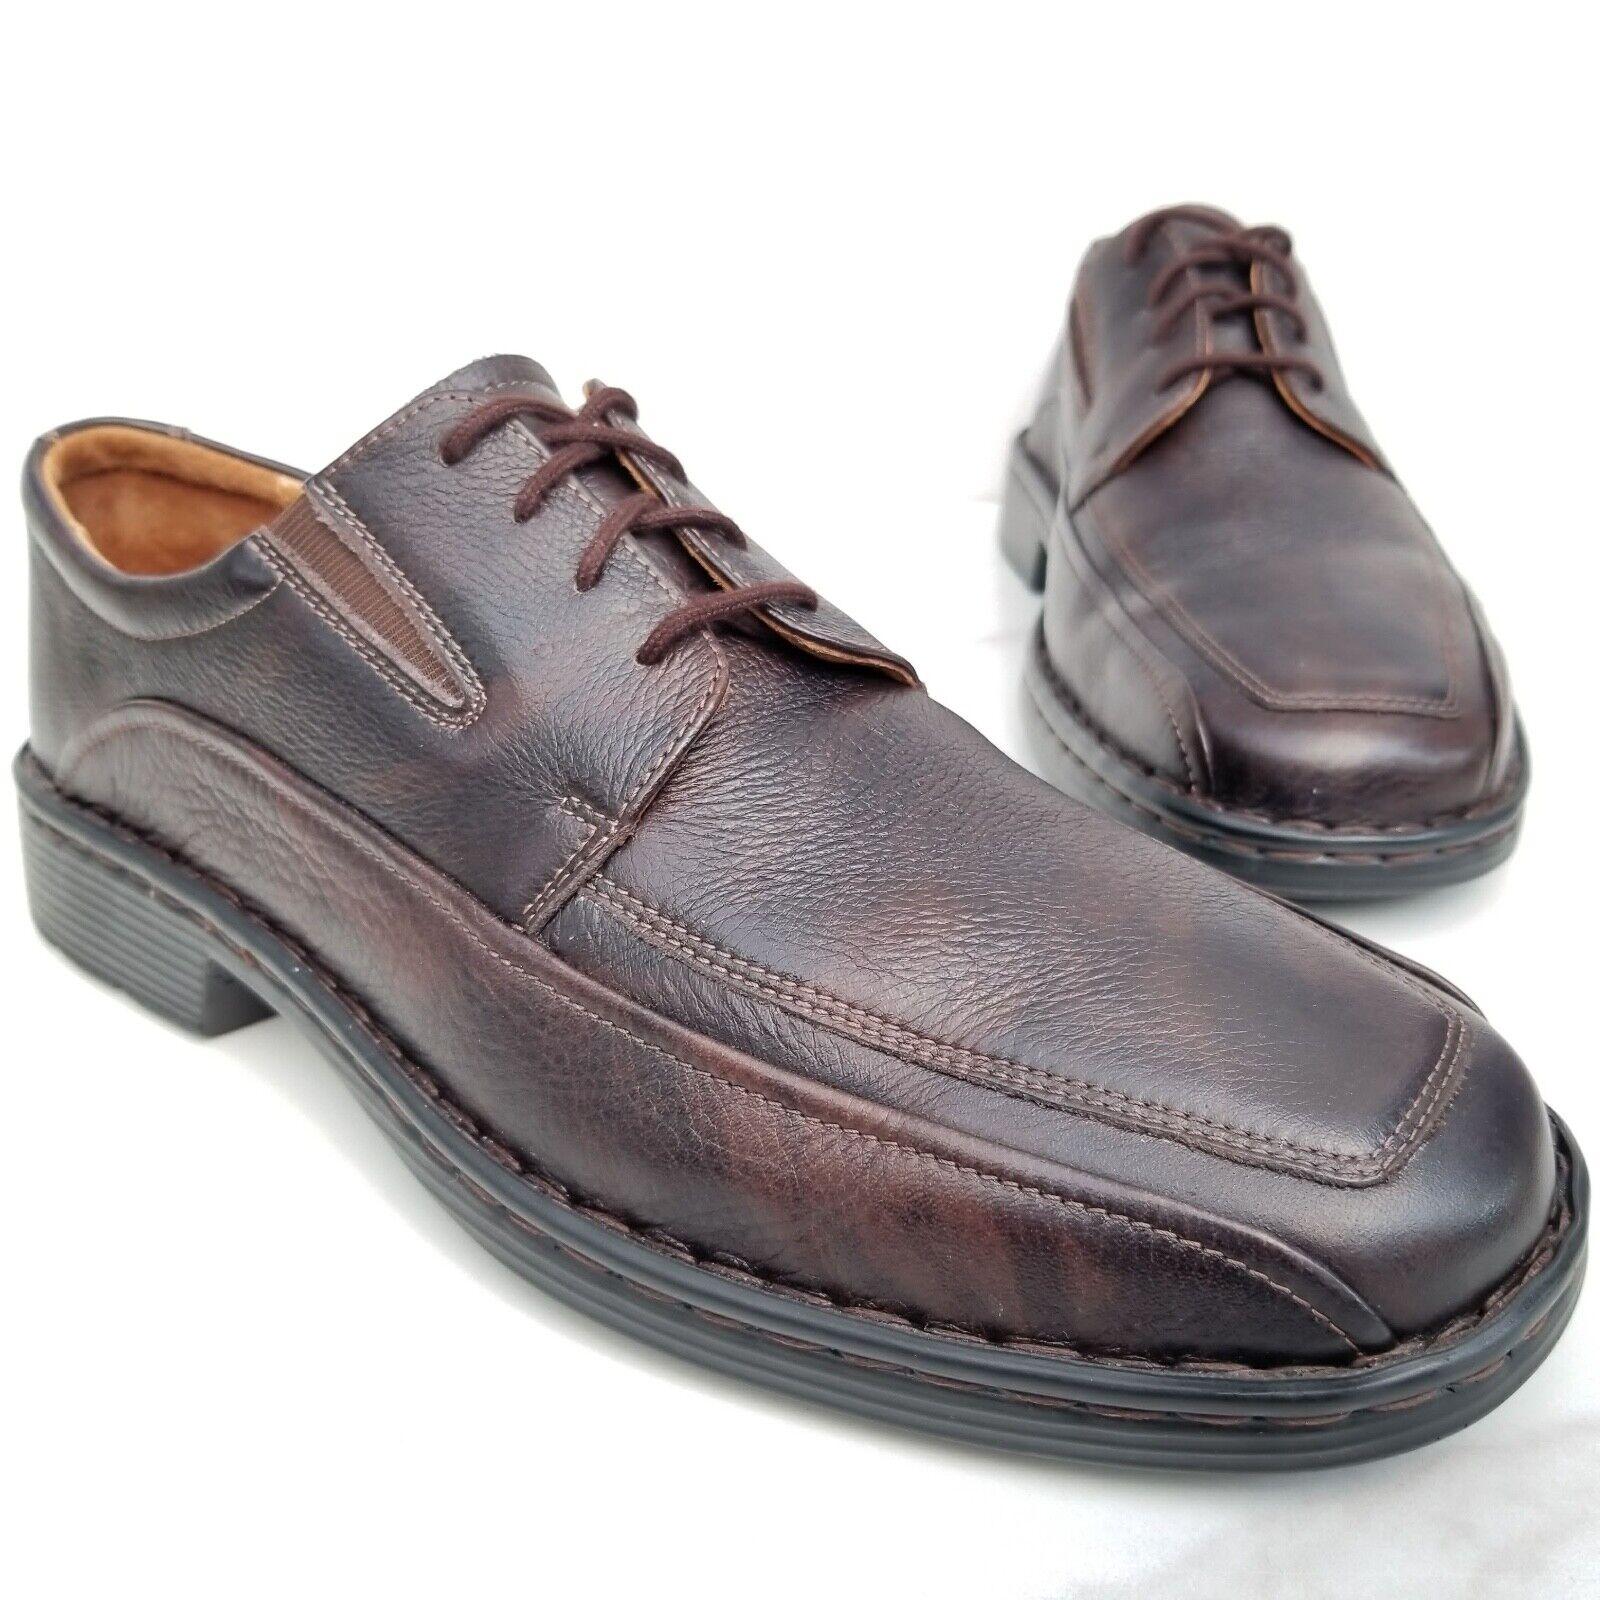 Josef Seibel Brown Leather Oxfords Casual Comfort shoes Bike Toe Mens 43 9-9.5